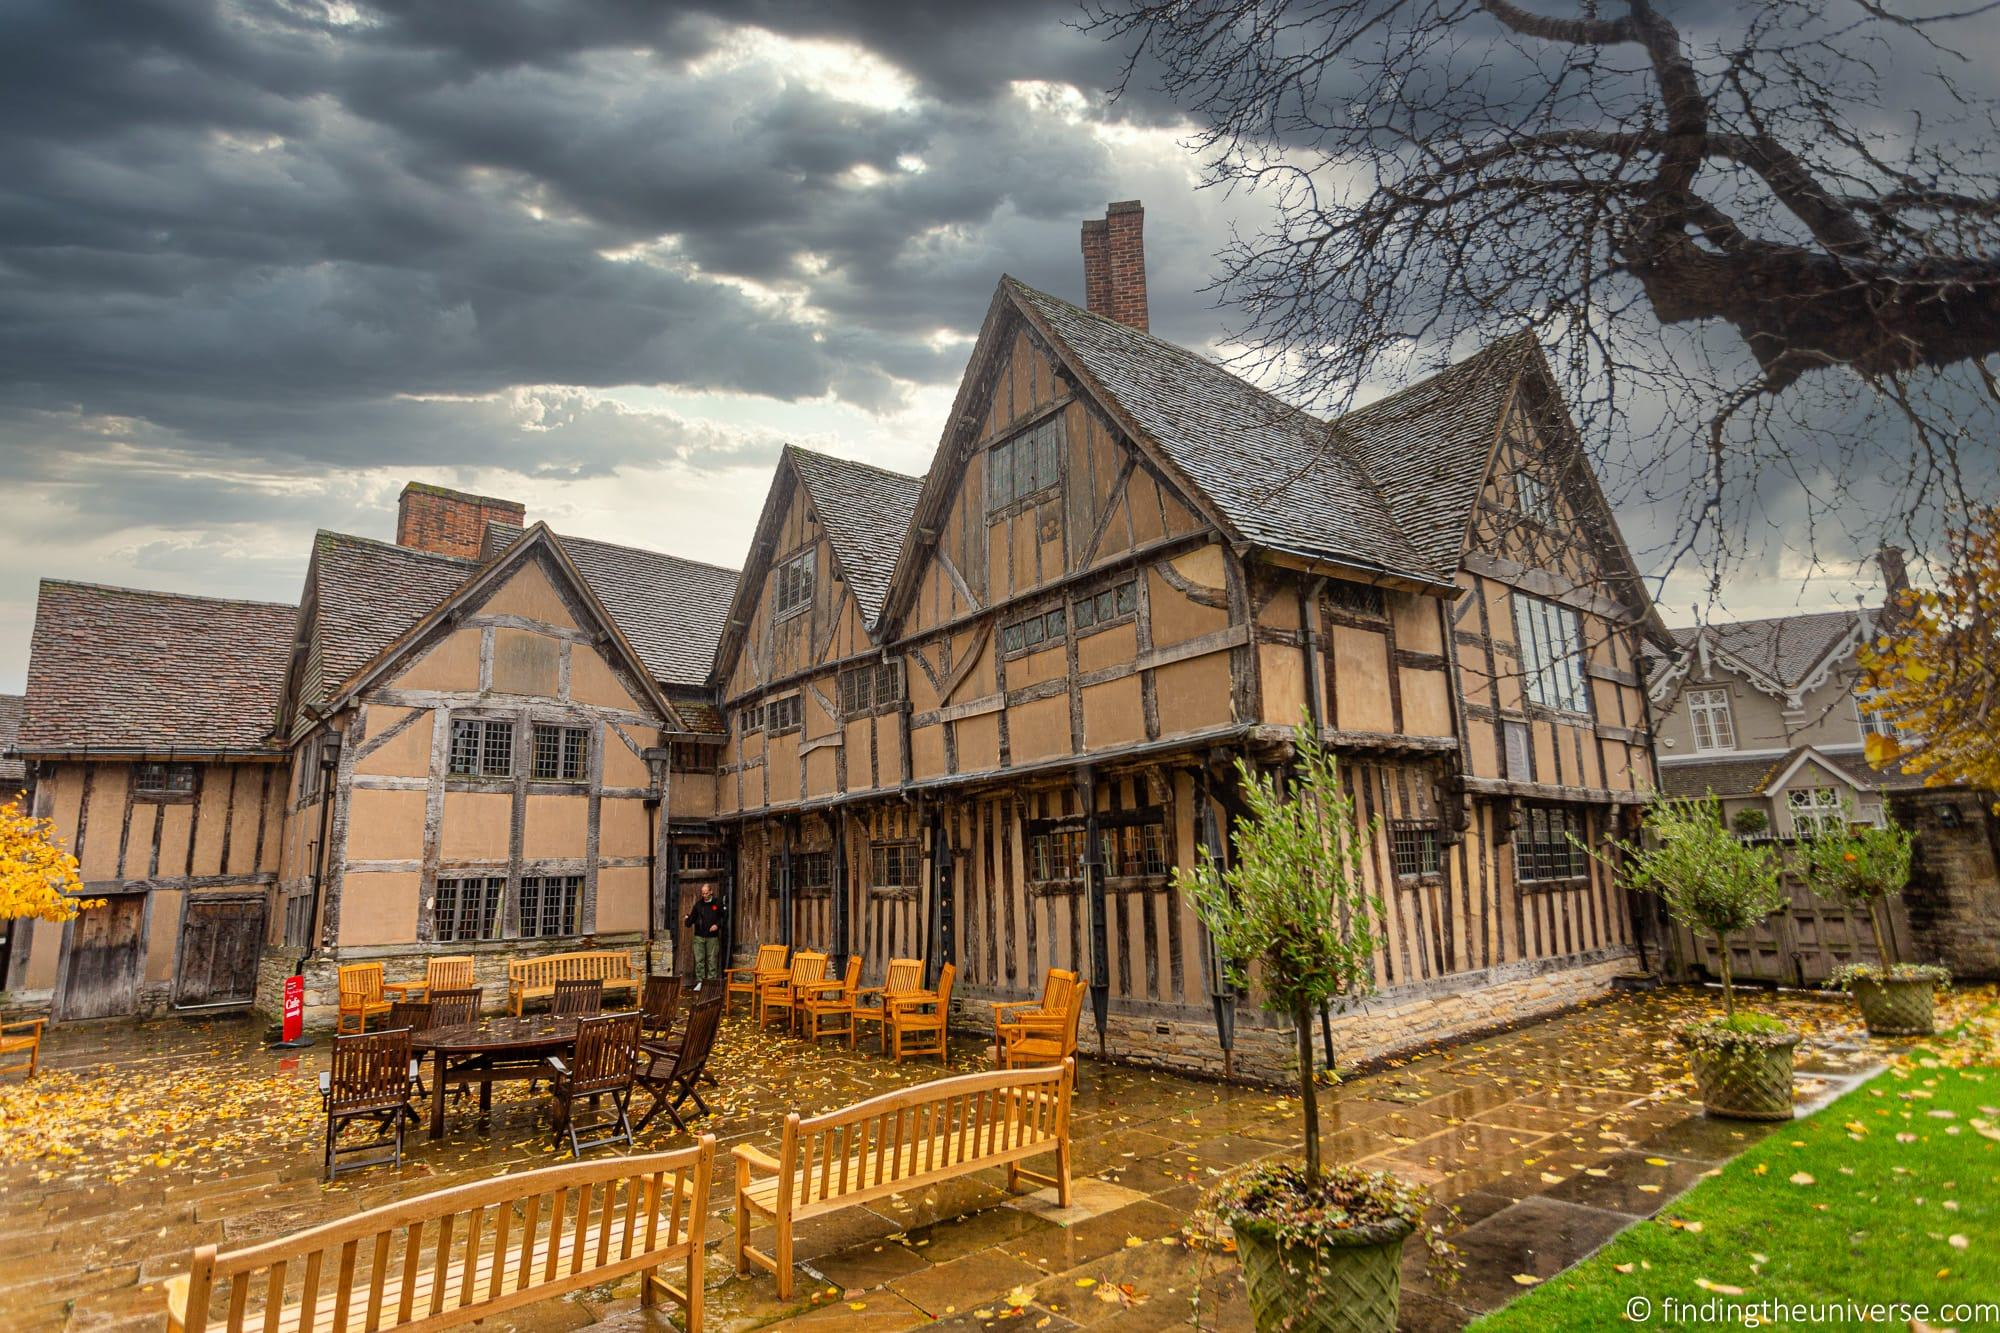 Halls Croft Stratford-Upon-Avon